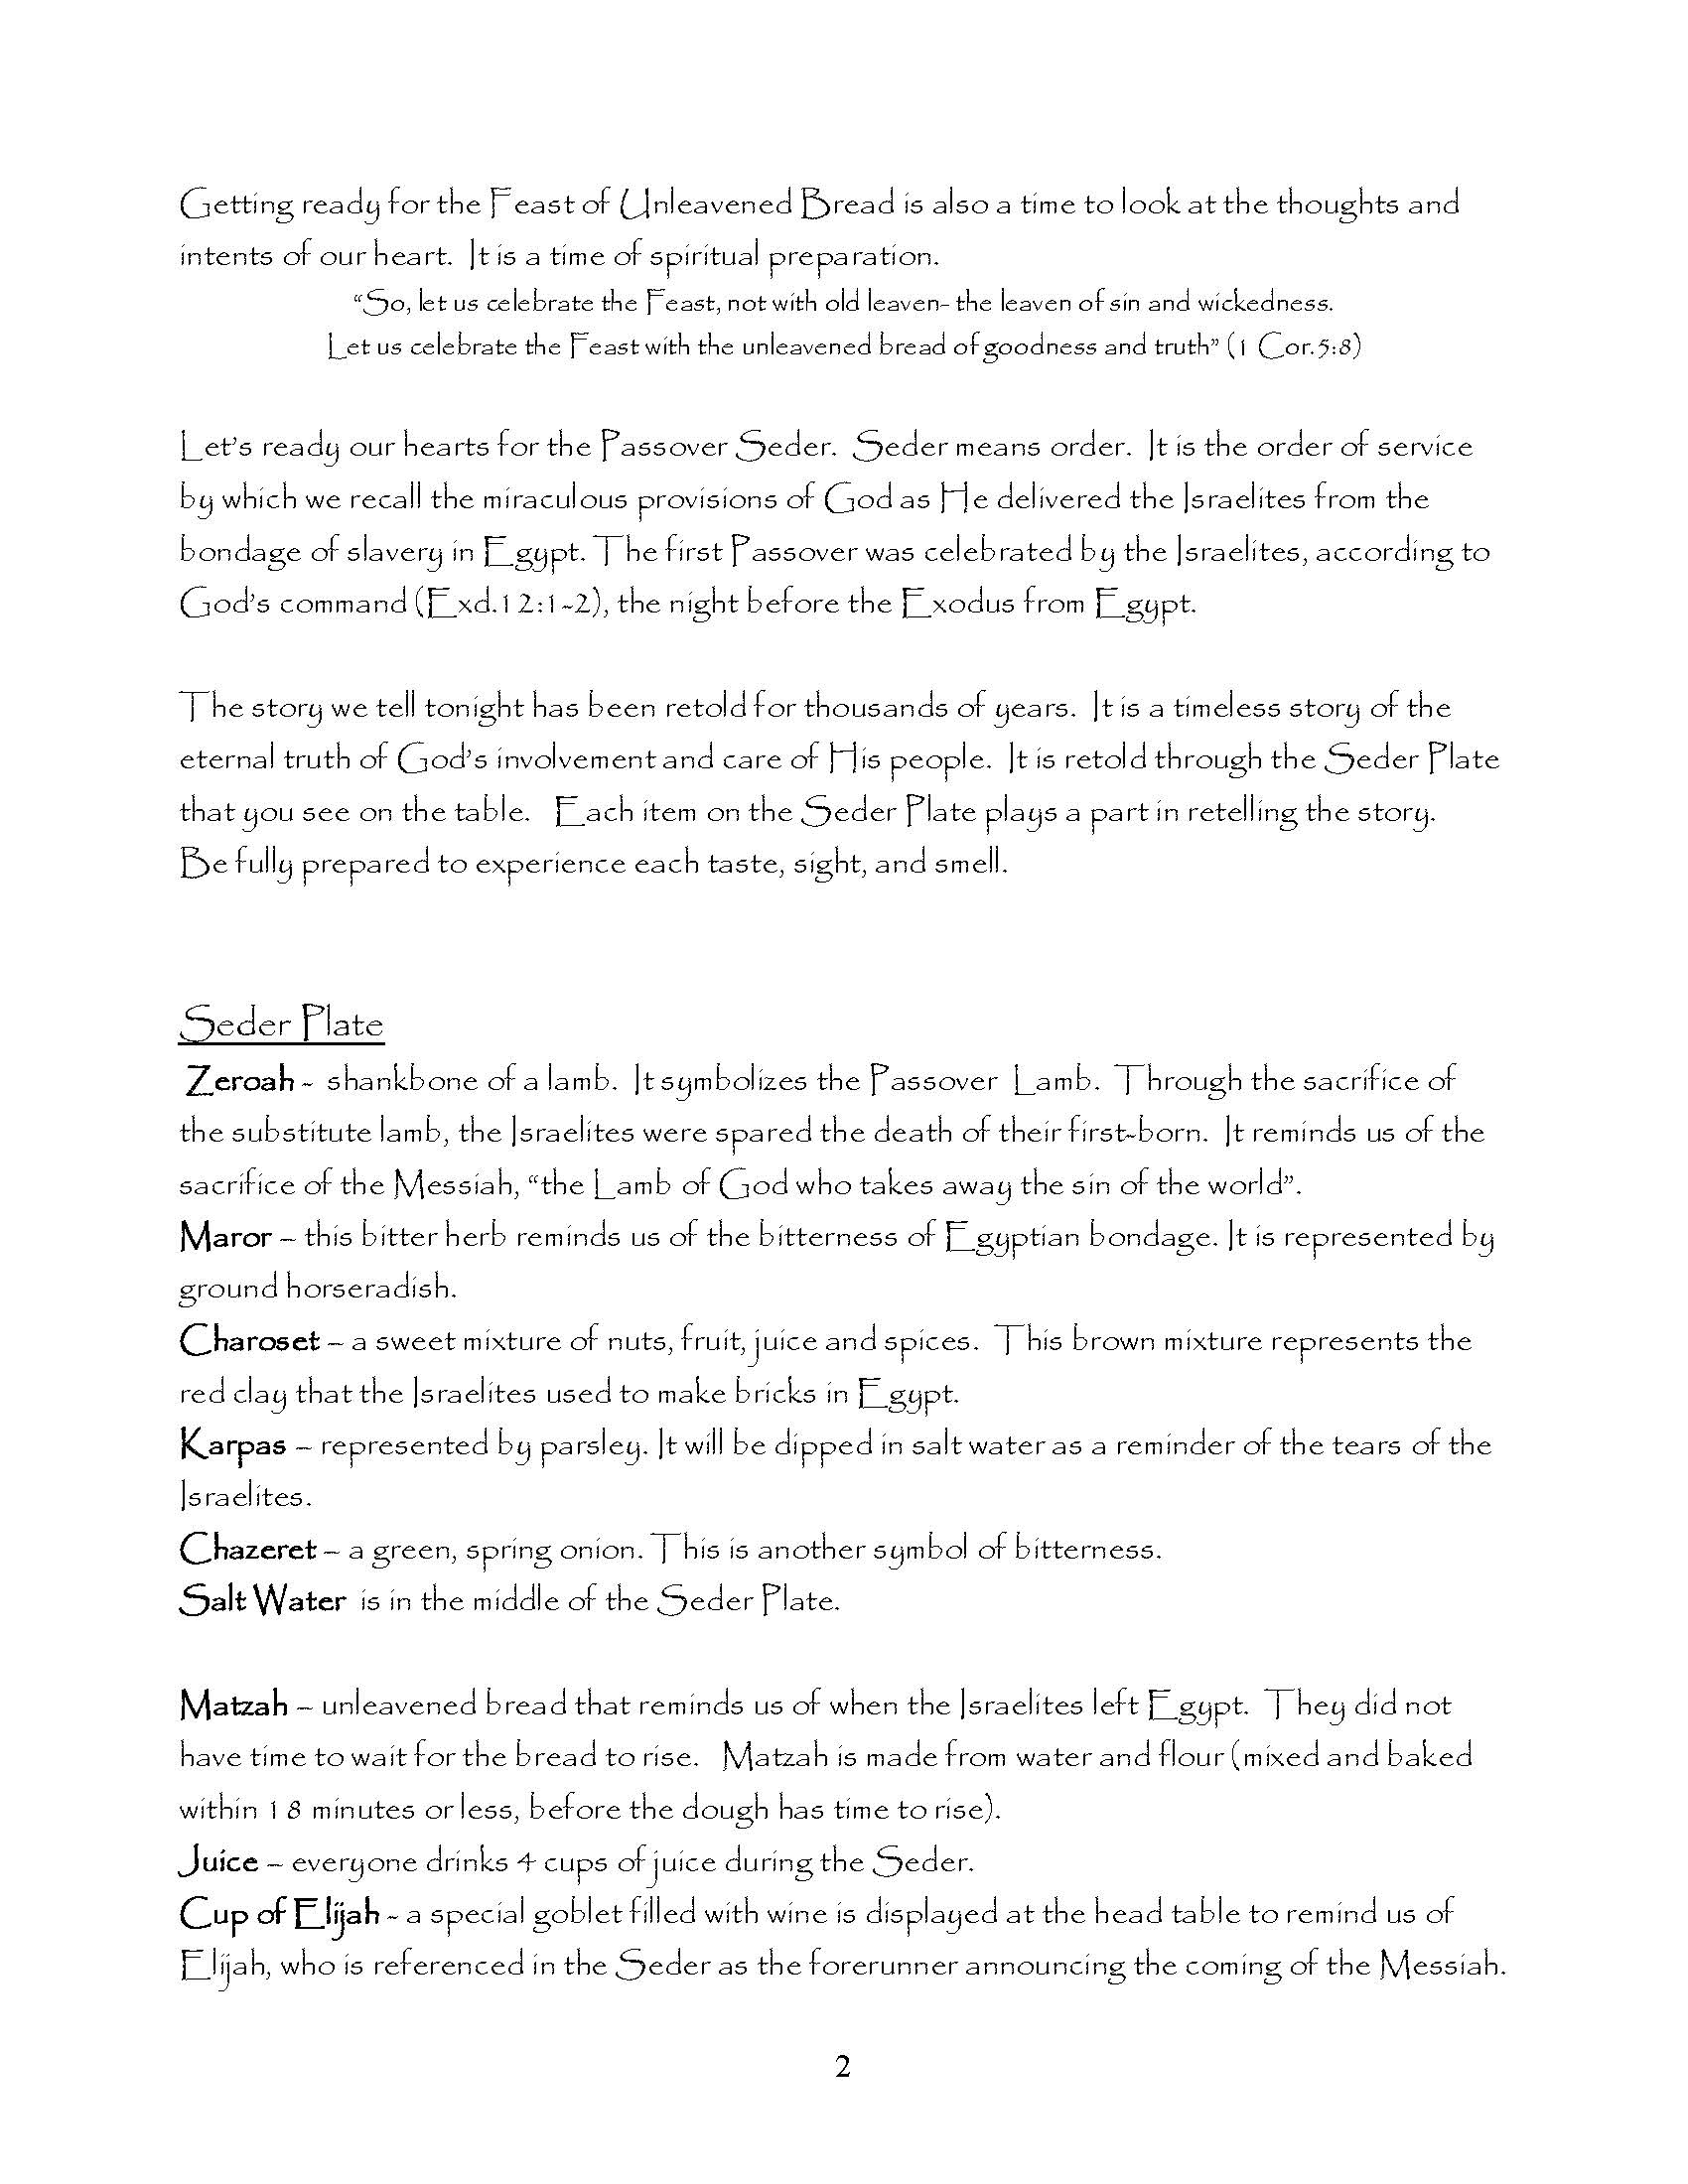 Messianic Passover Seder (Paperback) - Visual Story Bible - Free Printable Messianic Haggadah